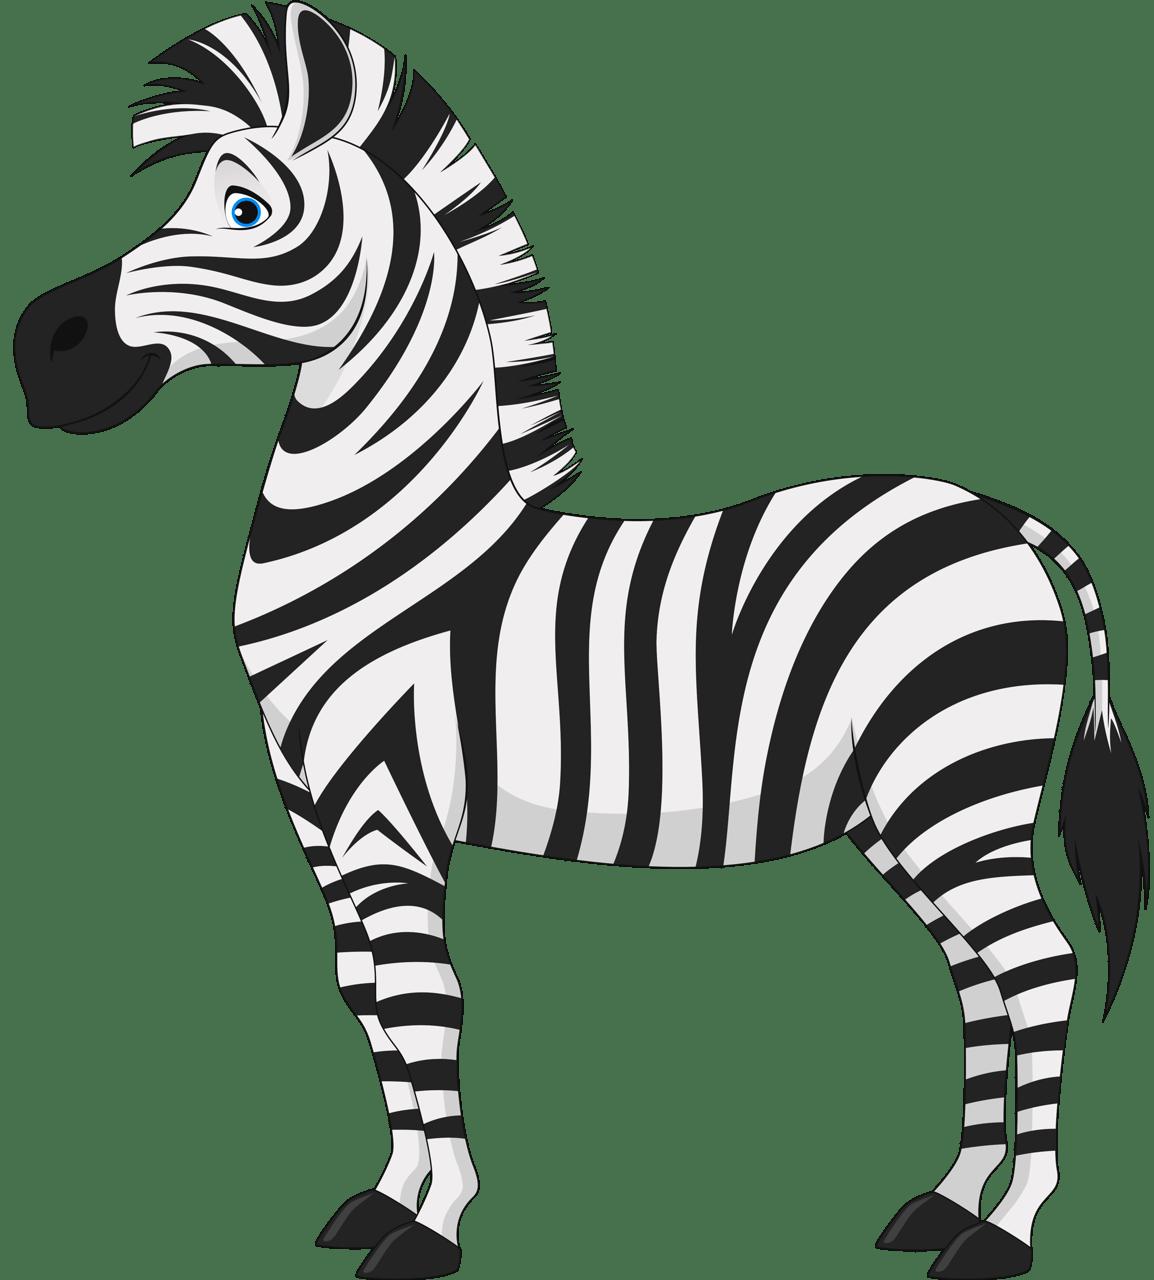 Clipart Zebra Sad Clipart Zebra Sad Transparent Free For